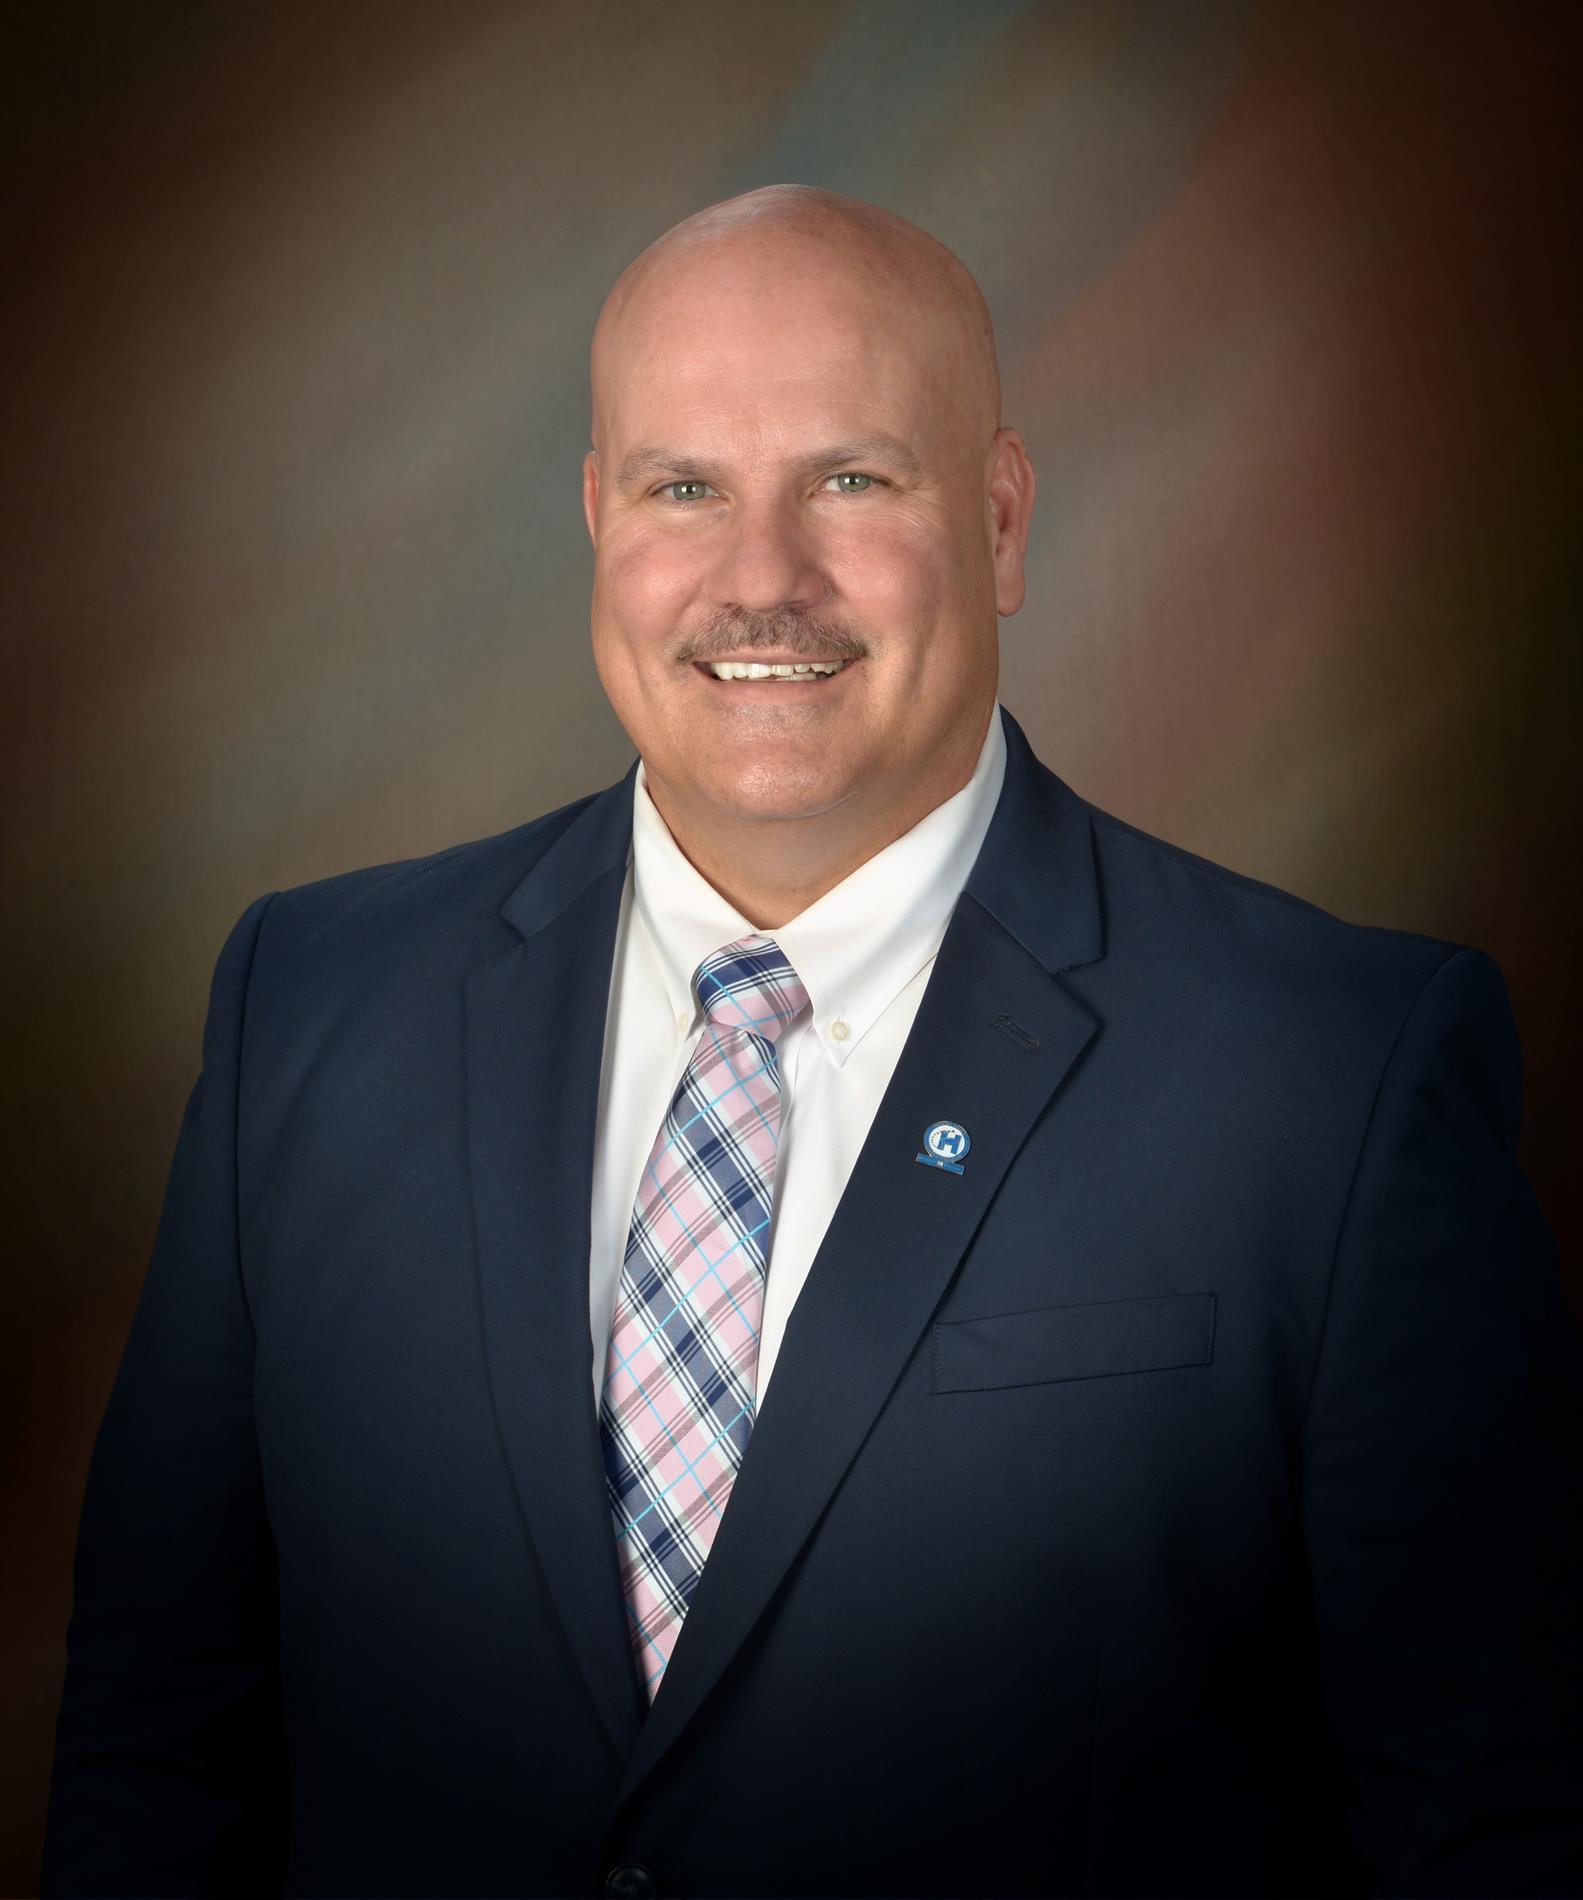 Dr. Mark Scott-Superintendent